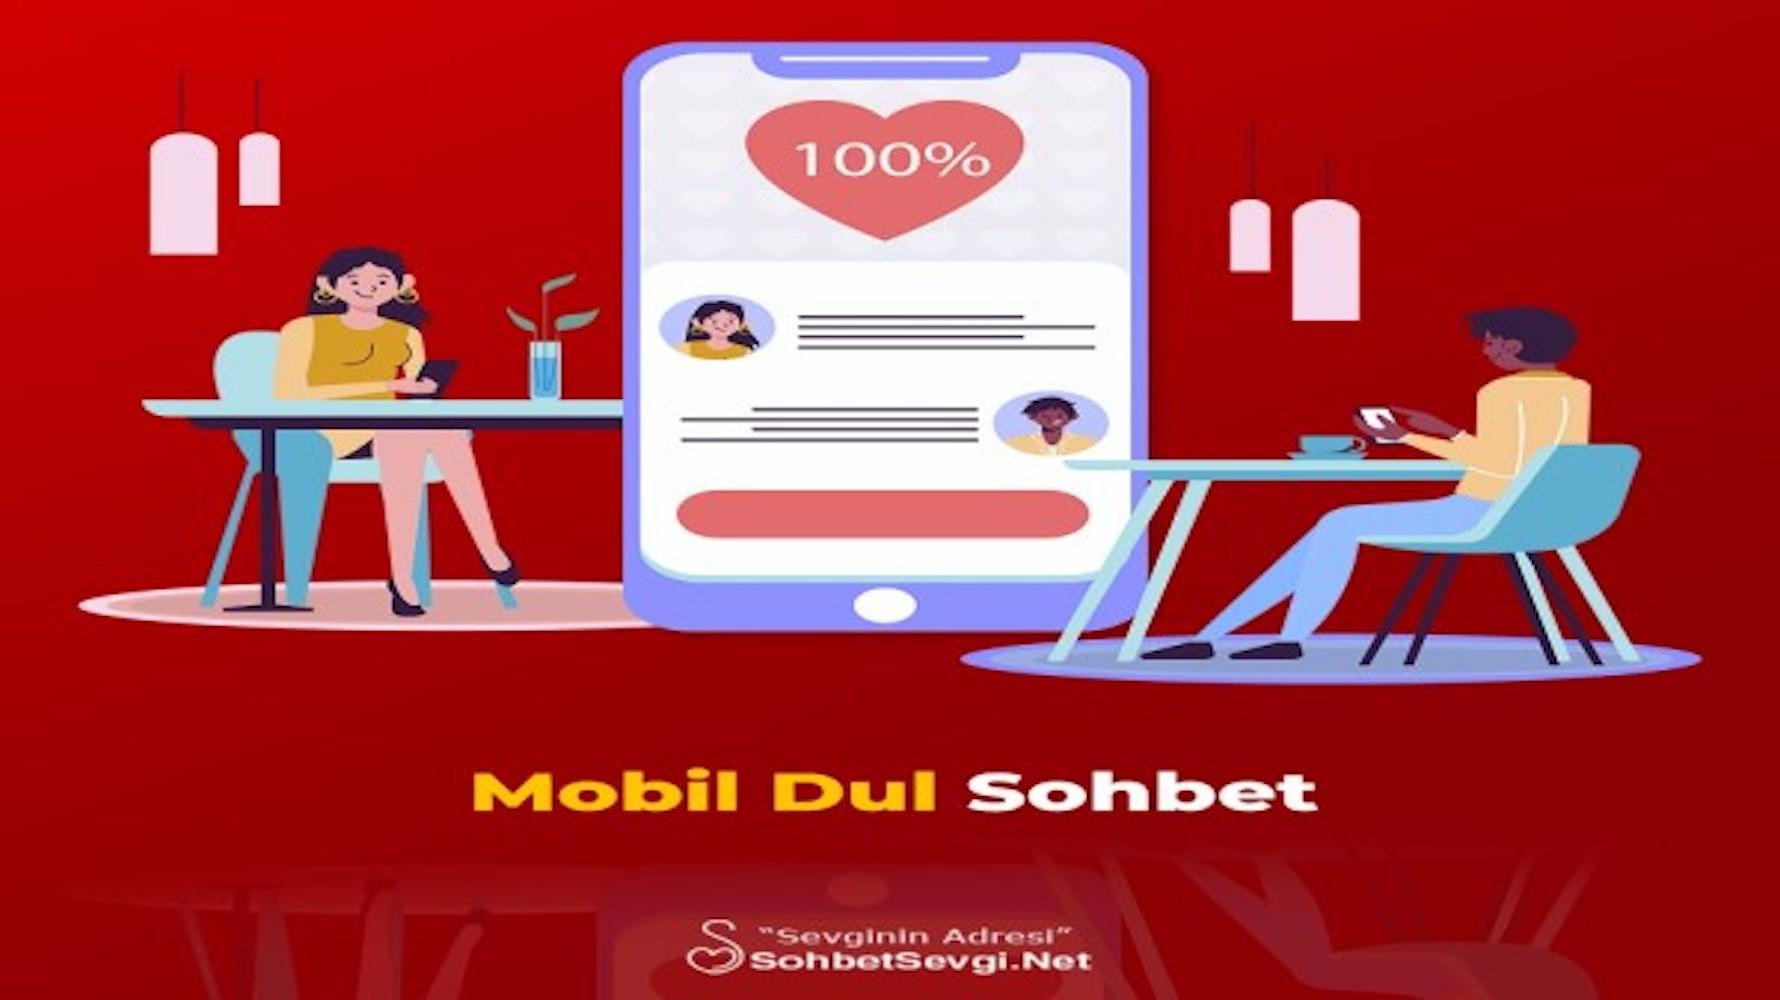 Mobile widow sohbet